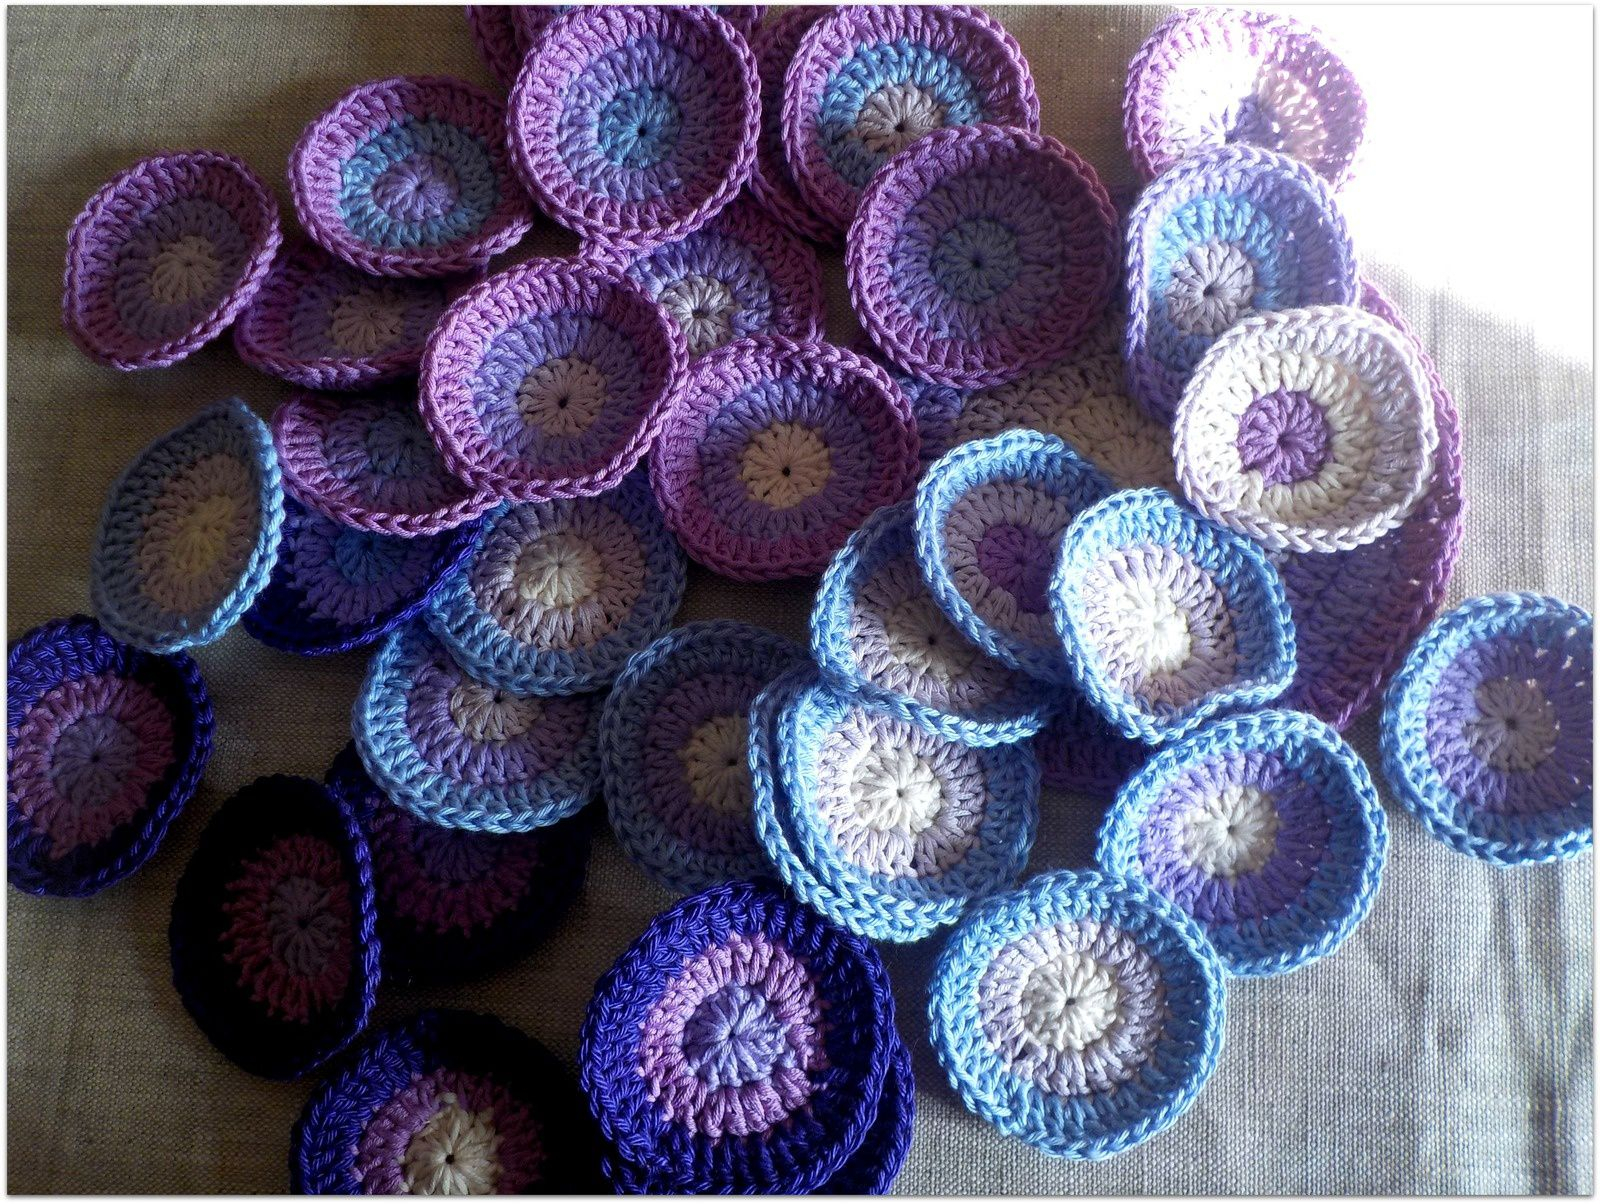 grands et petits violets...